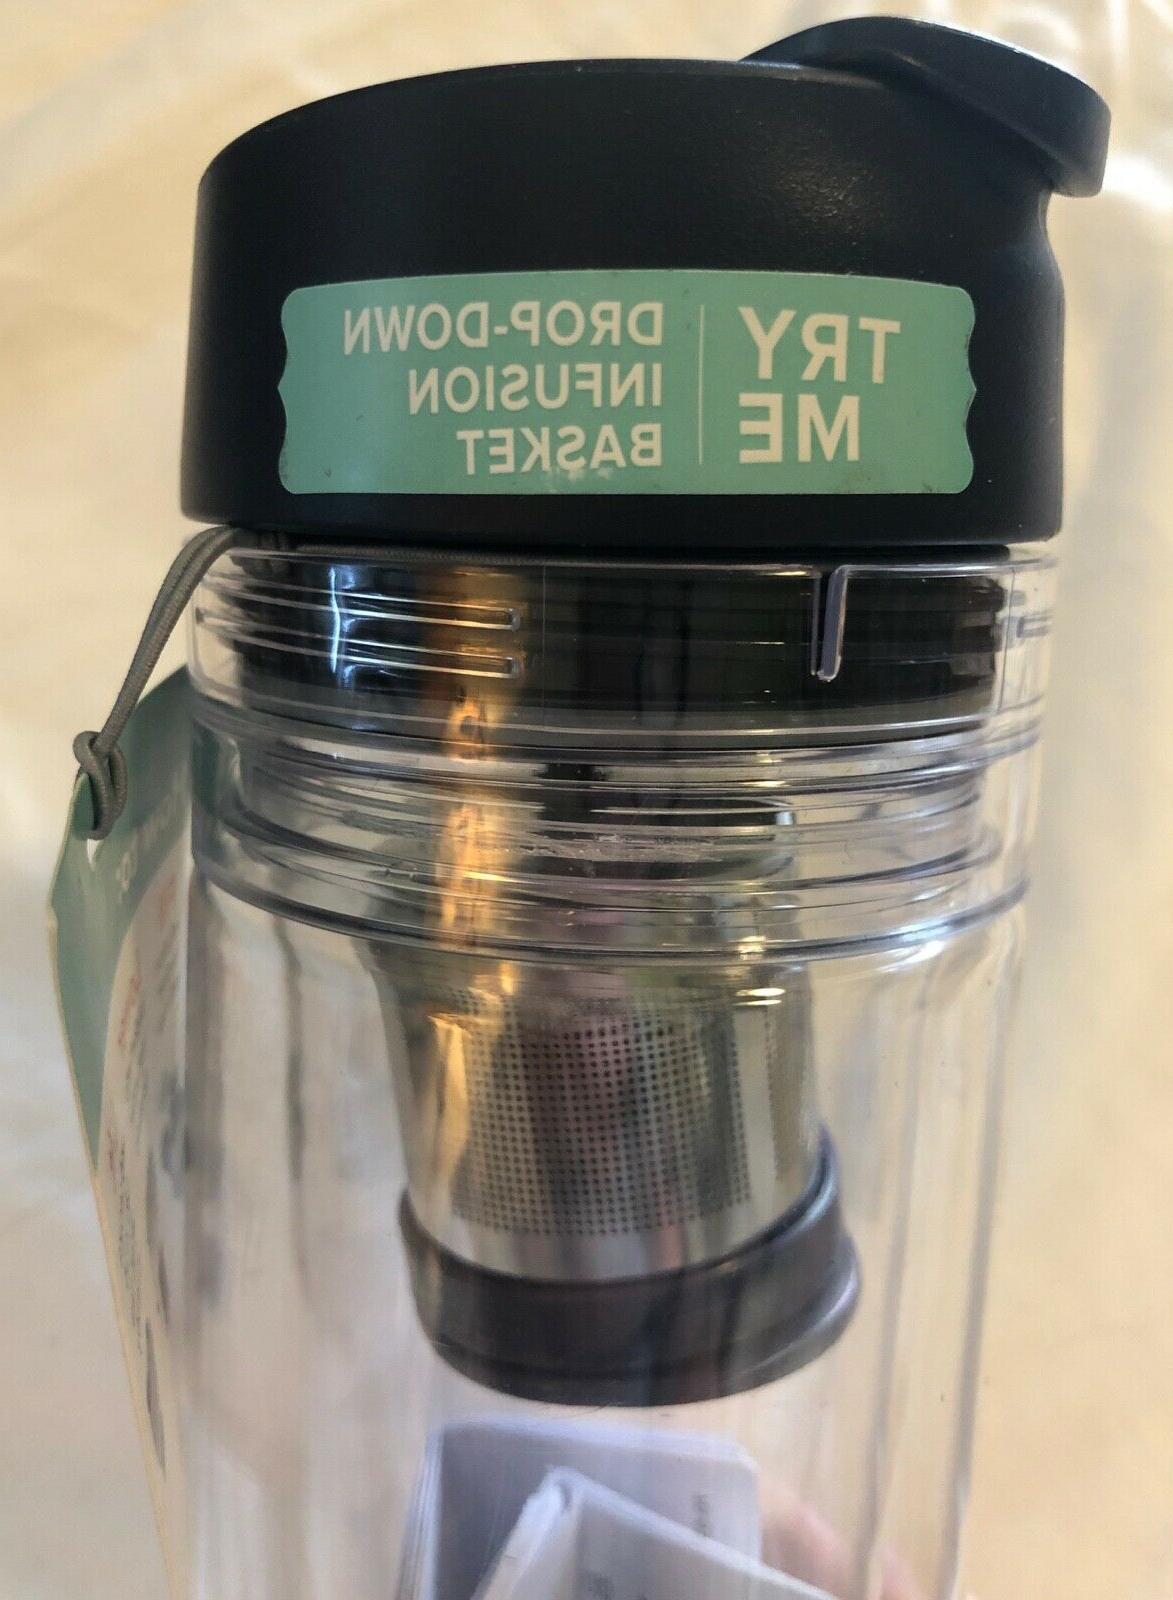 NEW Mug 12oz Insulated